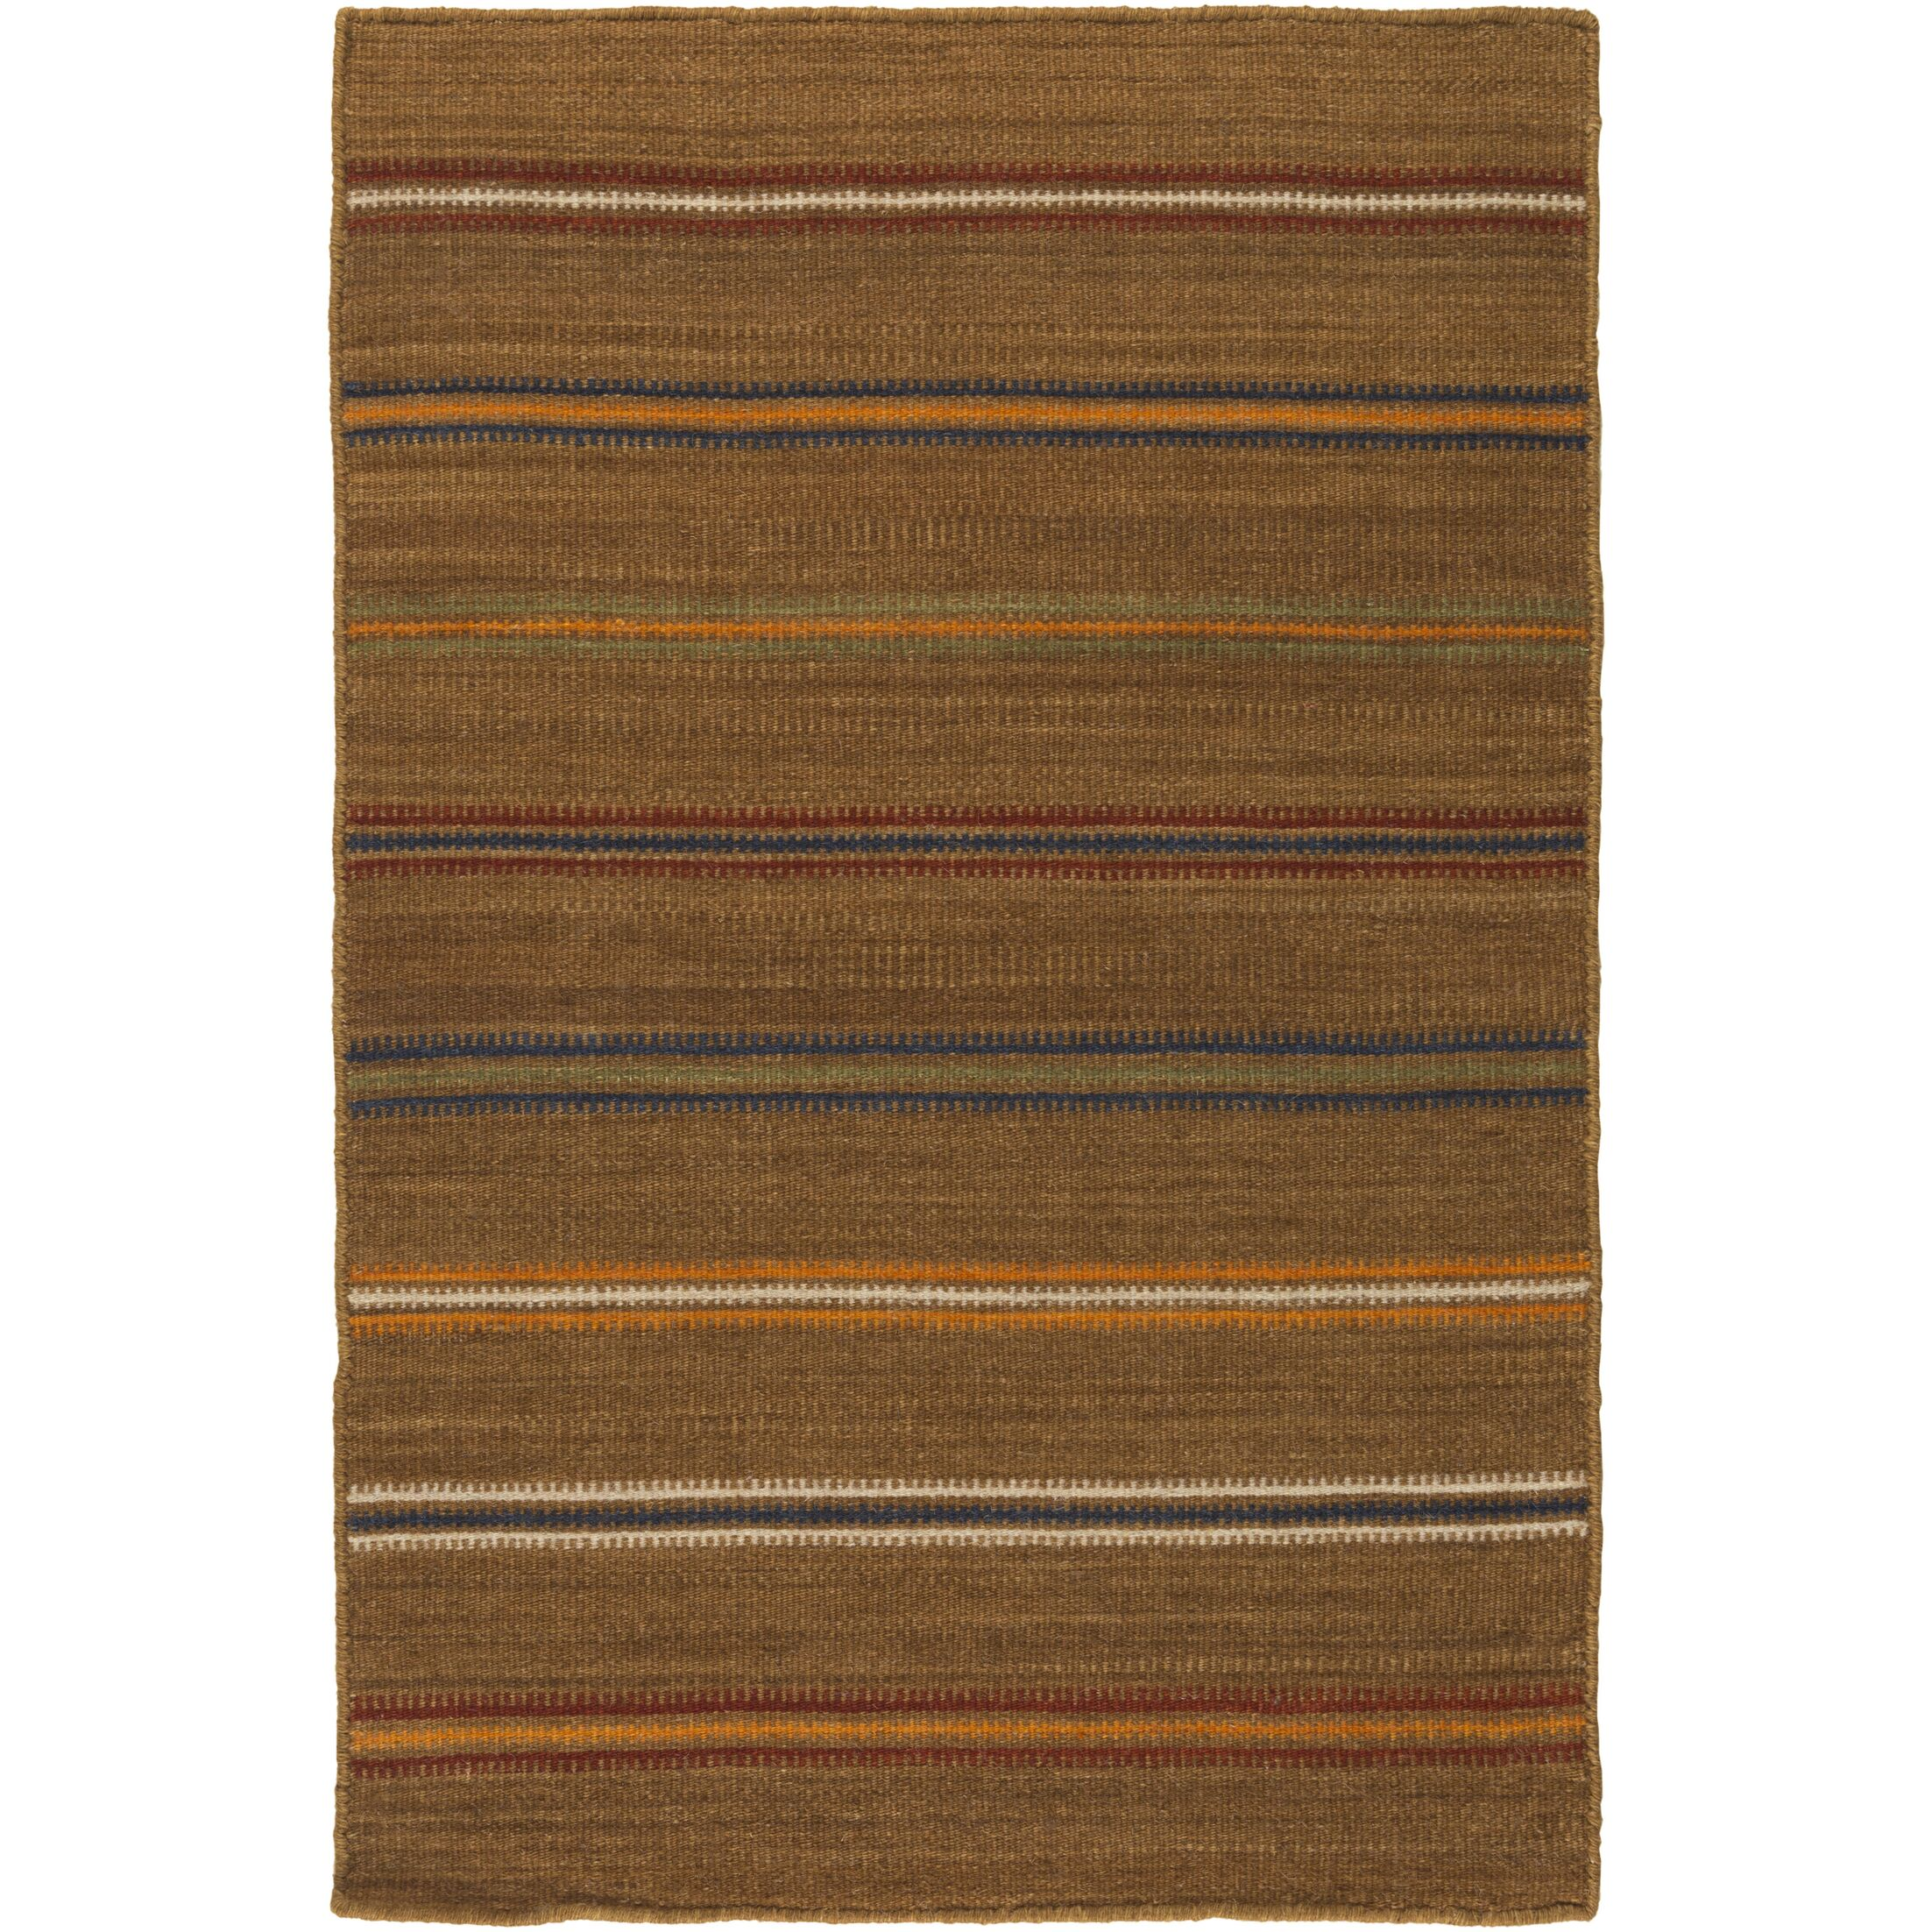 Nashville Hand-Woven Tan Area Rug Rug Size: Rectangle 6' x 9'